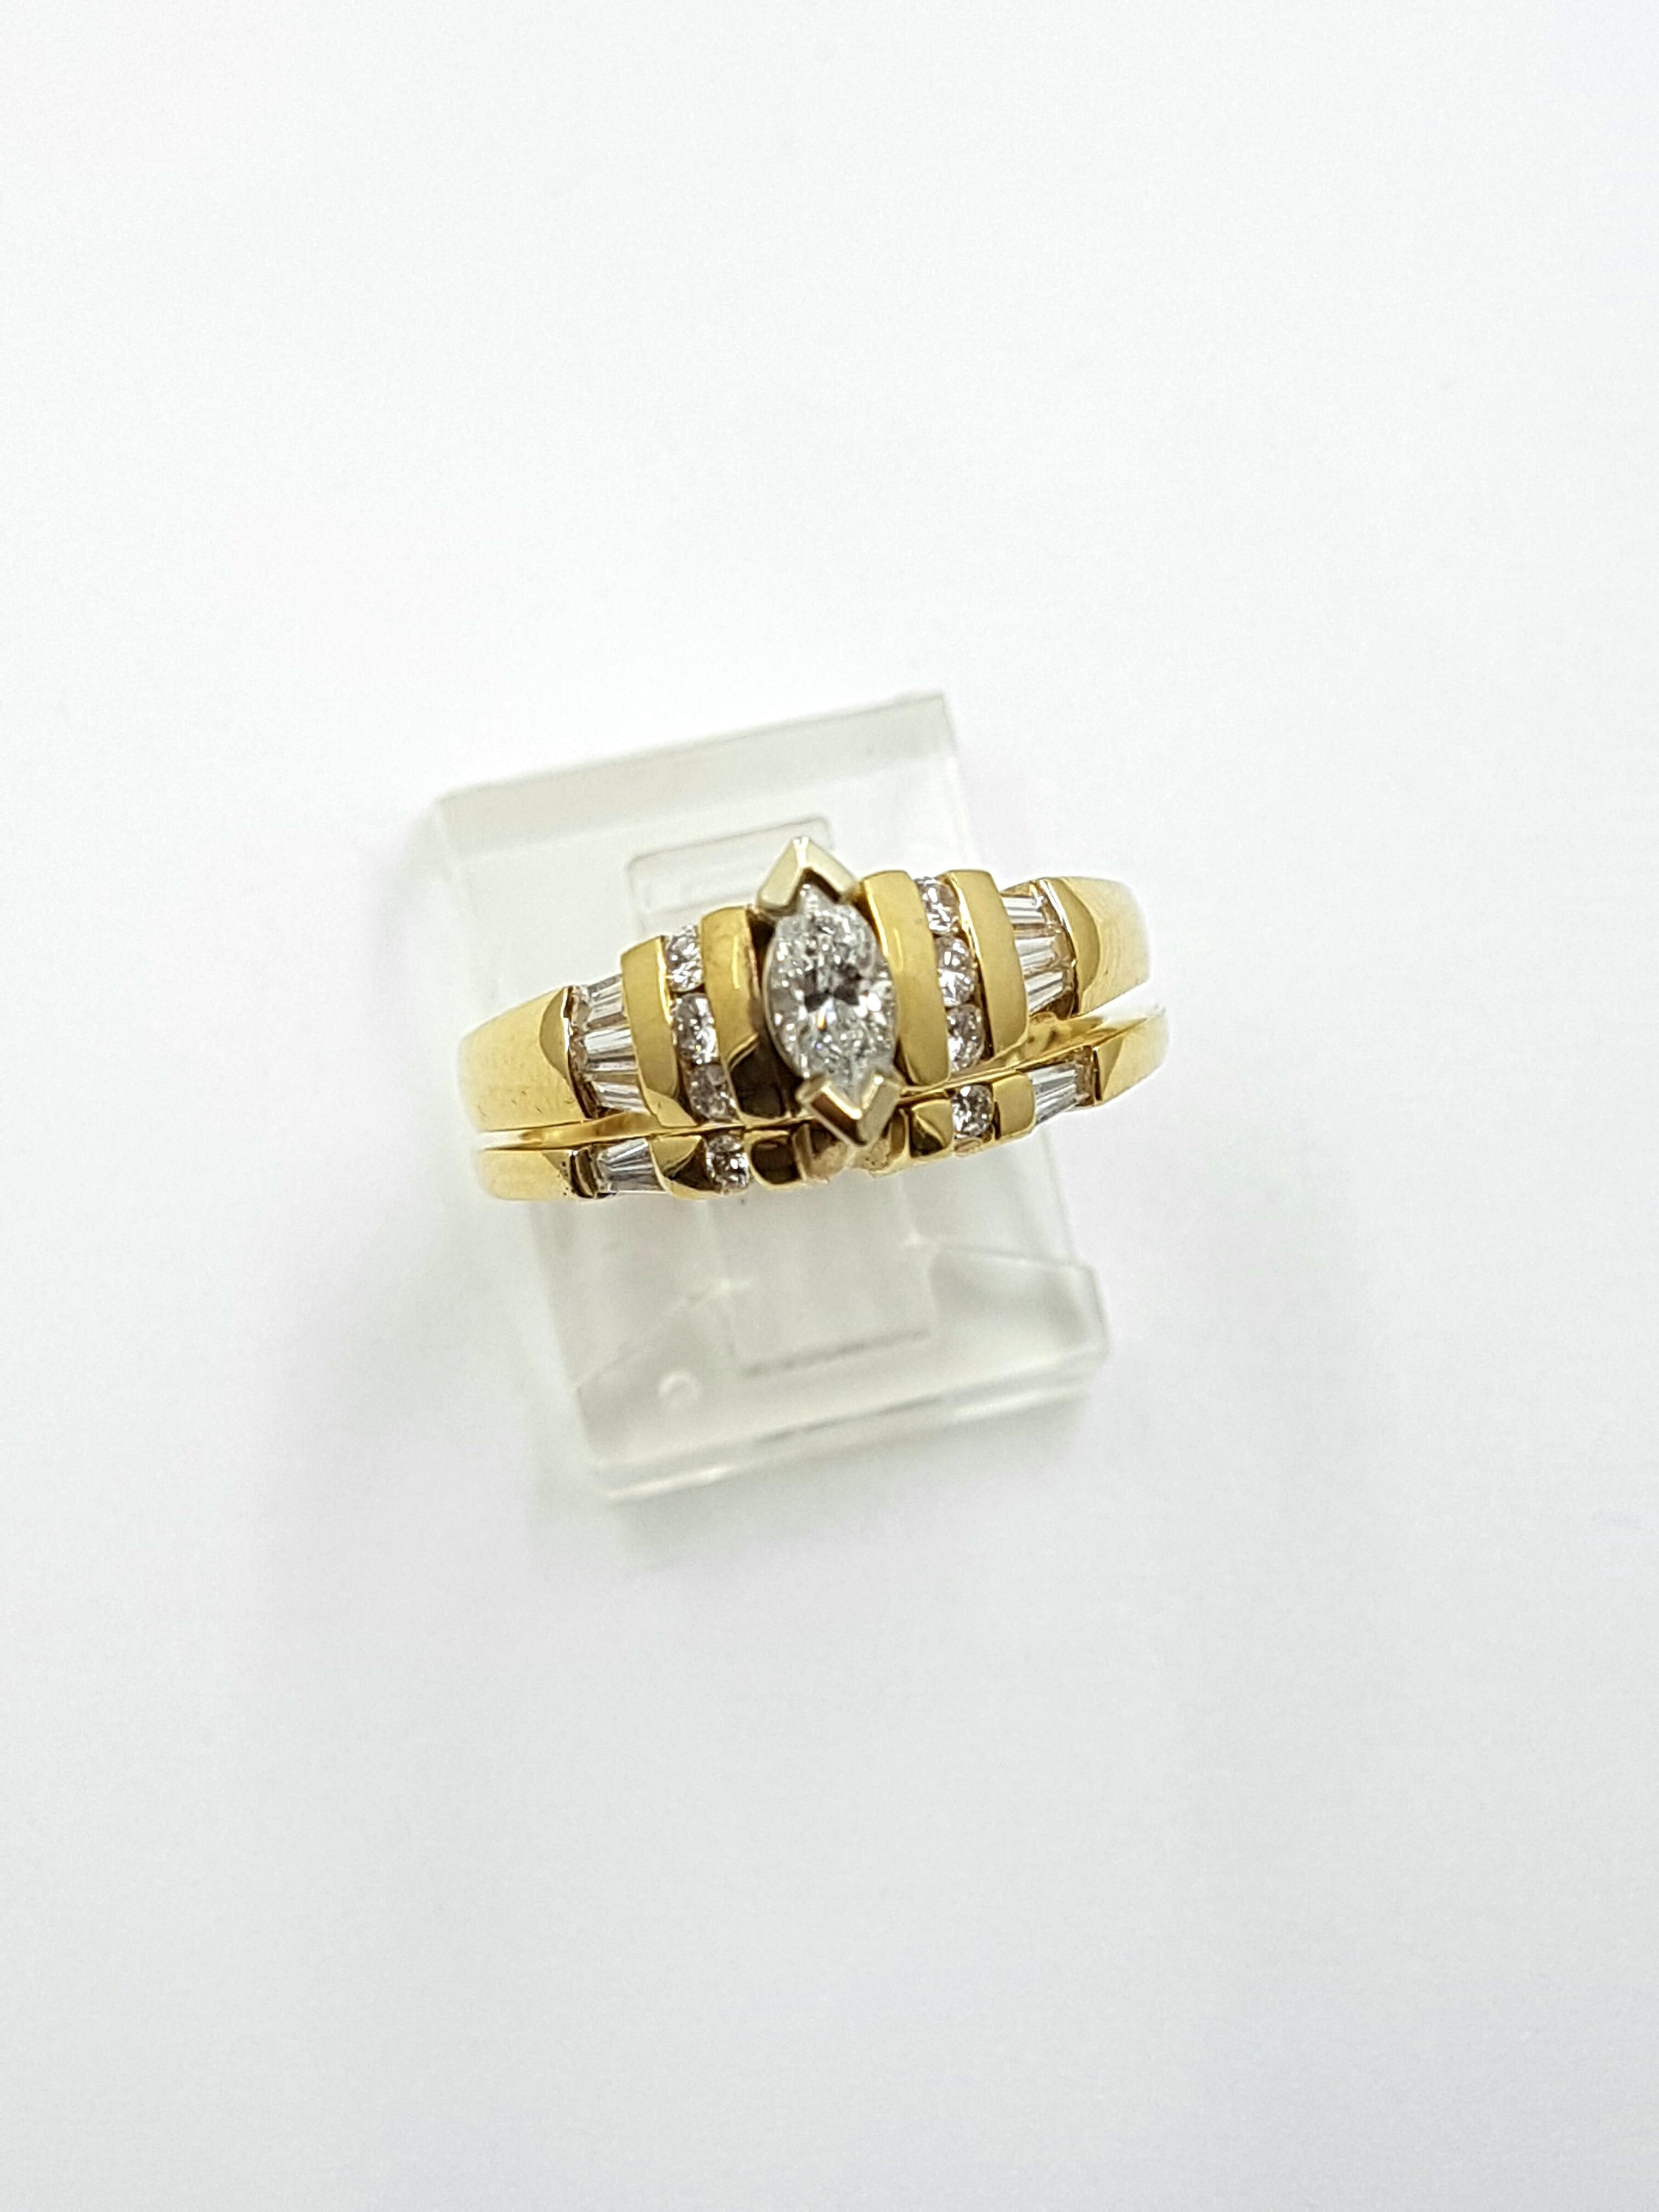 Engagement Ring & Wedding Band 14K Yellow Gold 0.61ct Total Regular Price $5240 SALE $1295 Ref: DER235+W